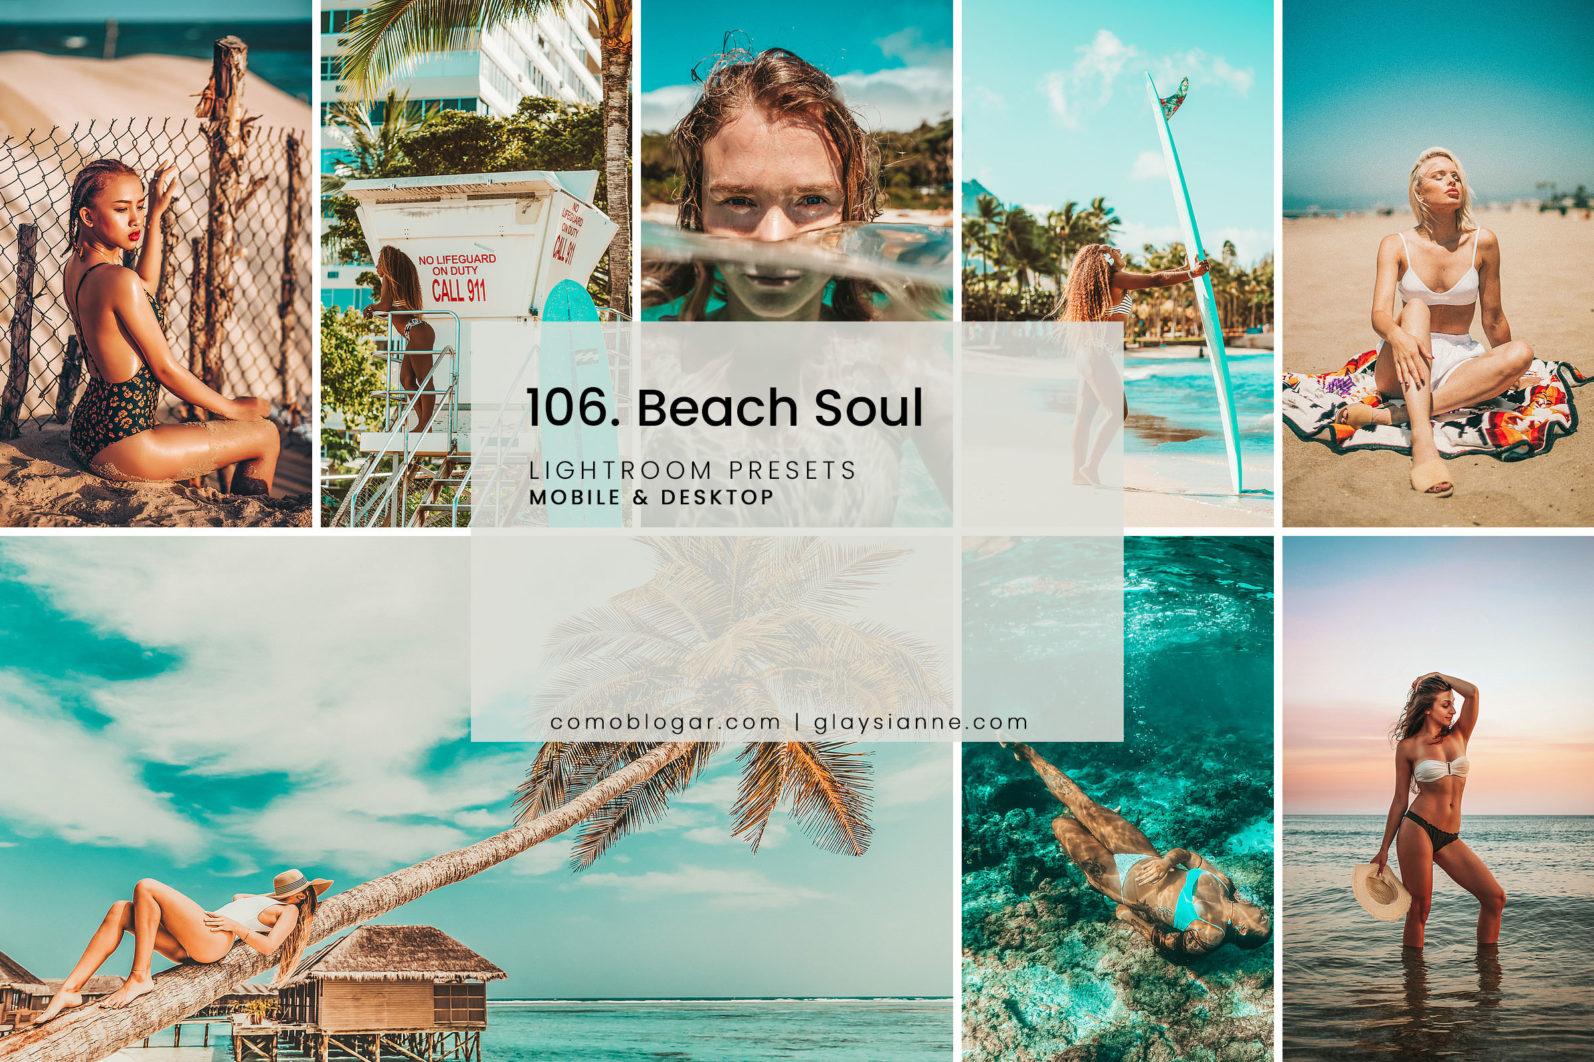 106. Beach Soul Presets - 106.BEACHSOUL 1 -